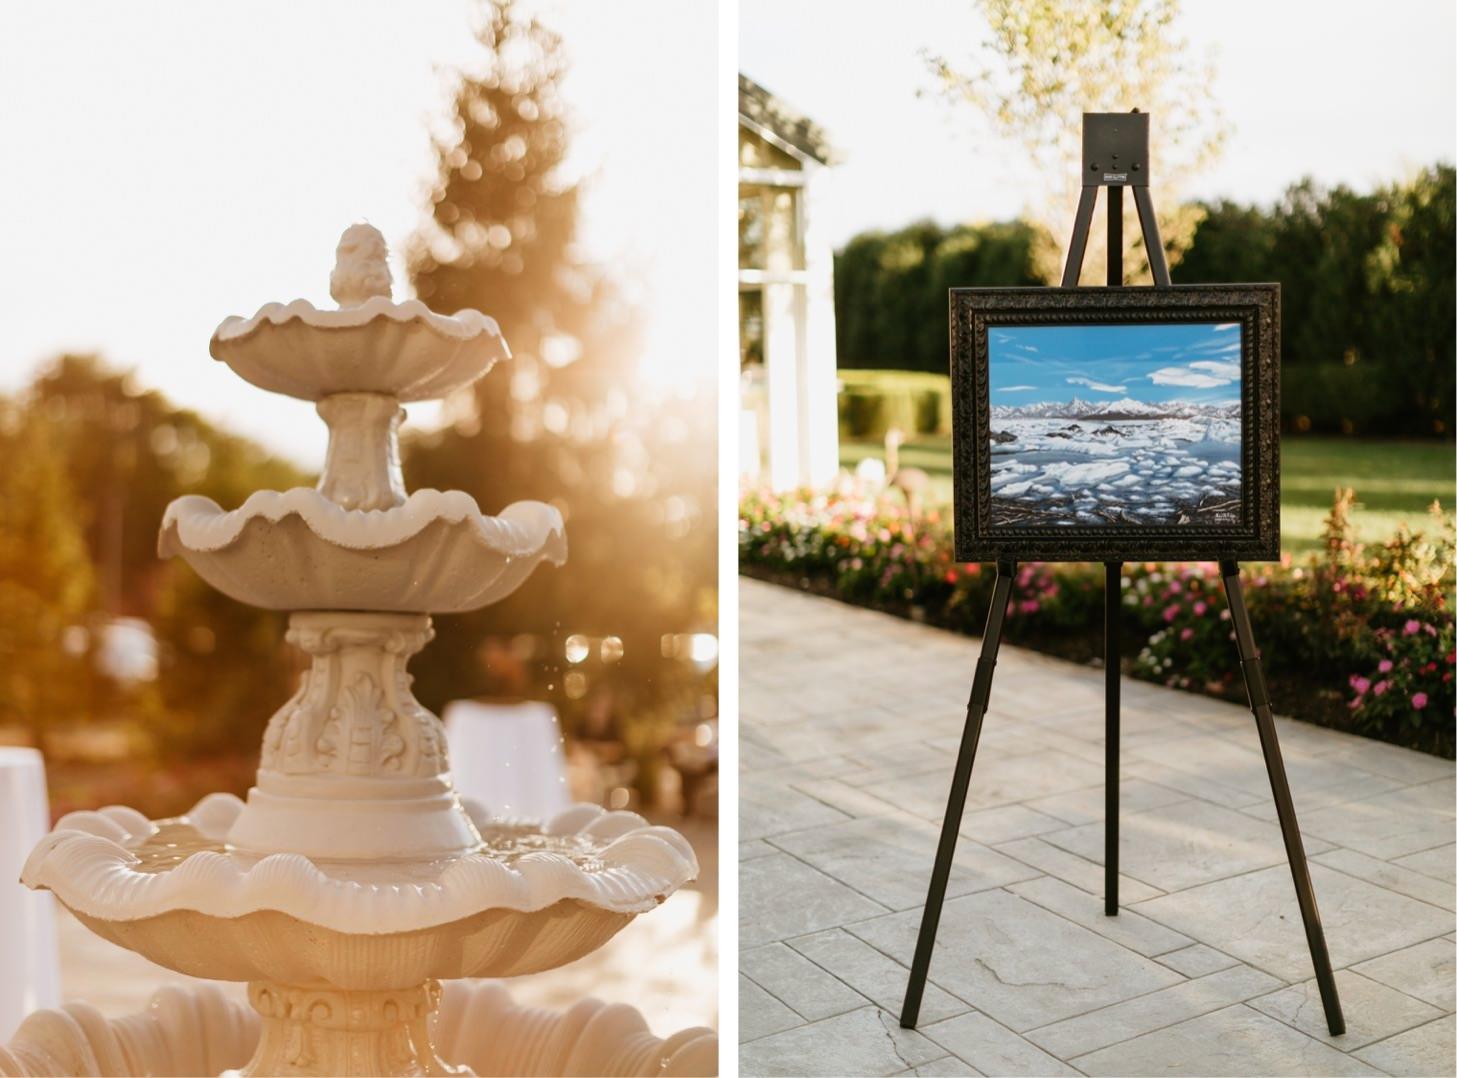 ritz-charles-wedding-reception-downtown-indianapolis-wedding-photographer003.JPG